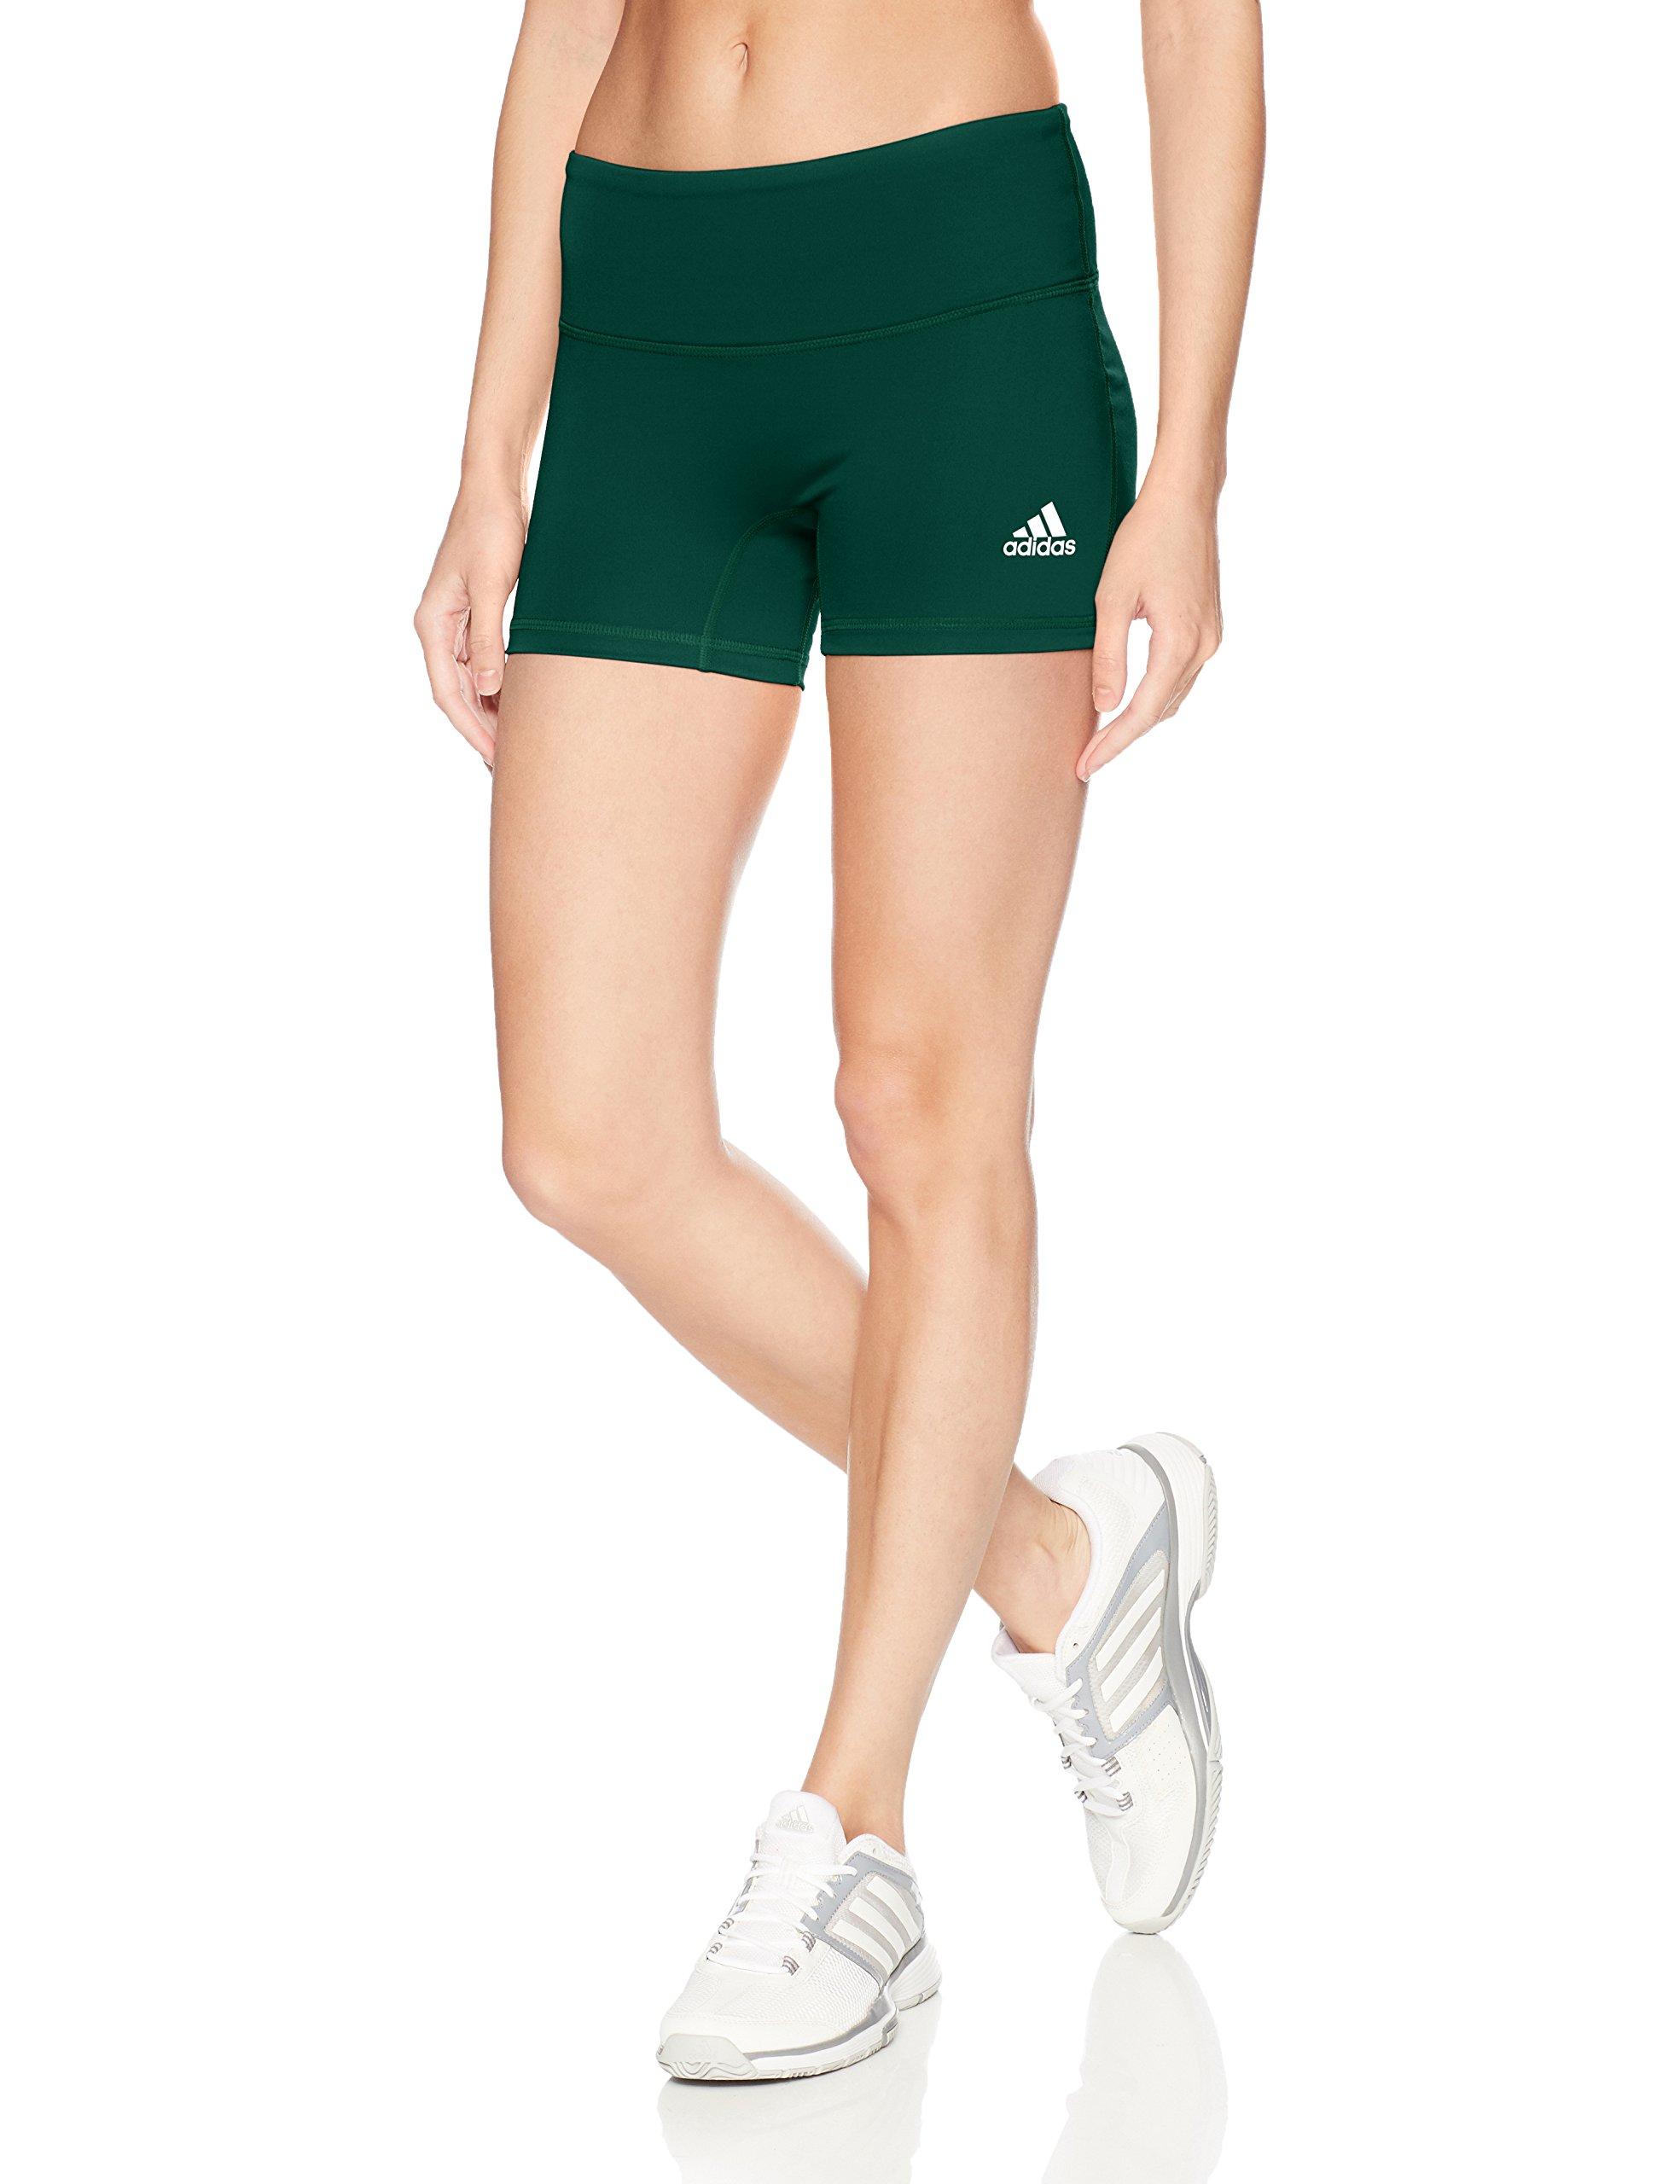 adidas Women's 4 Inch Short Tight, Dark Green, Large by adidas